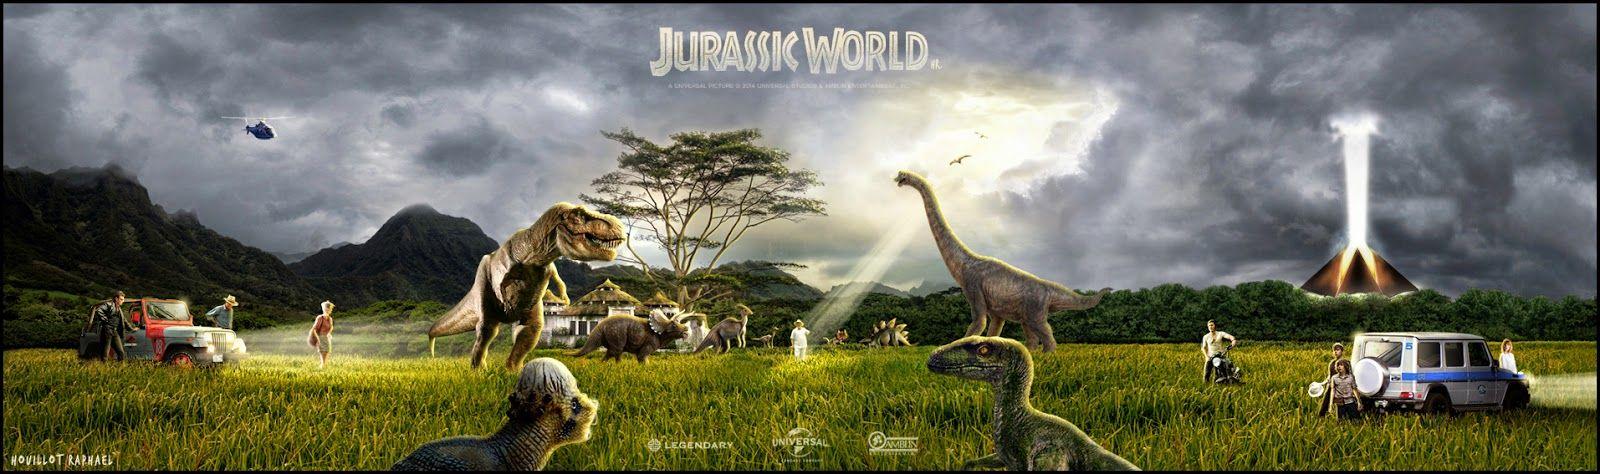 Jurassic World Poster (2)